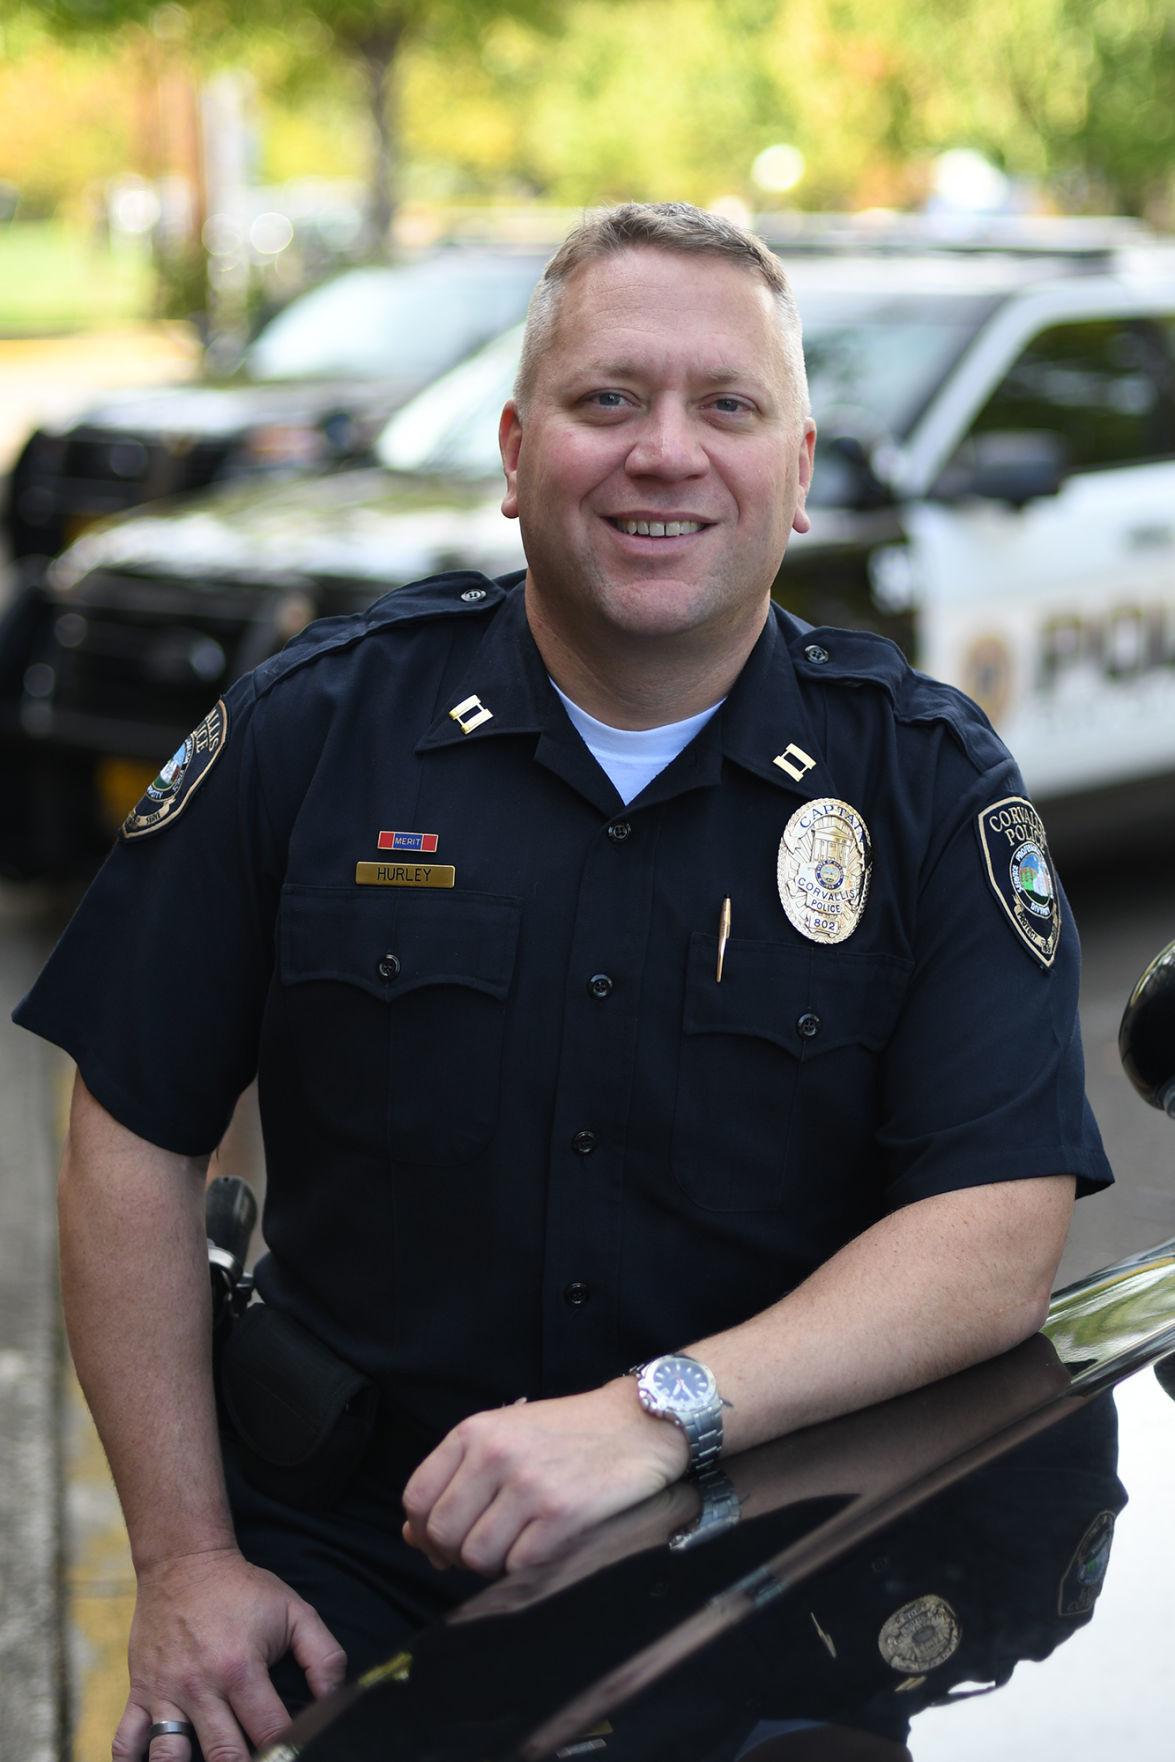 The Police Teacher Corvallis Police Captain Combines